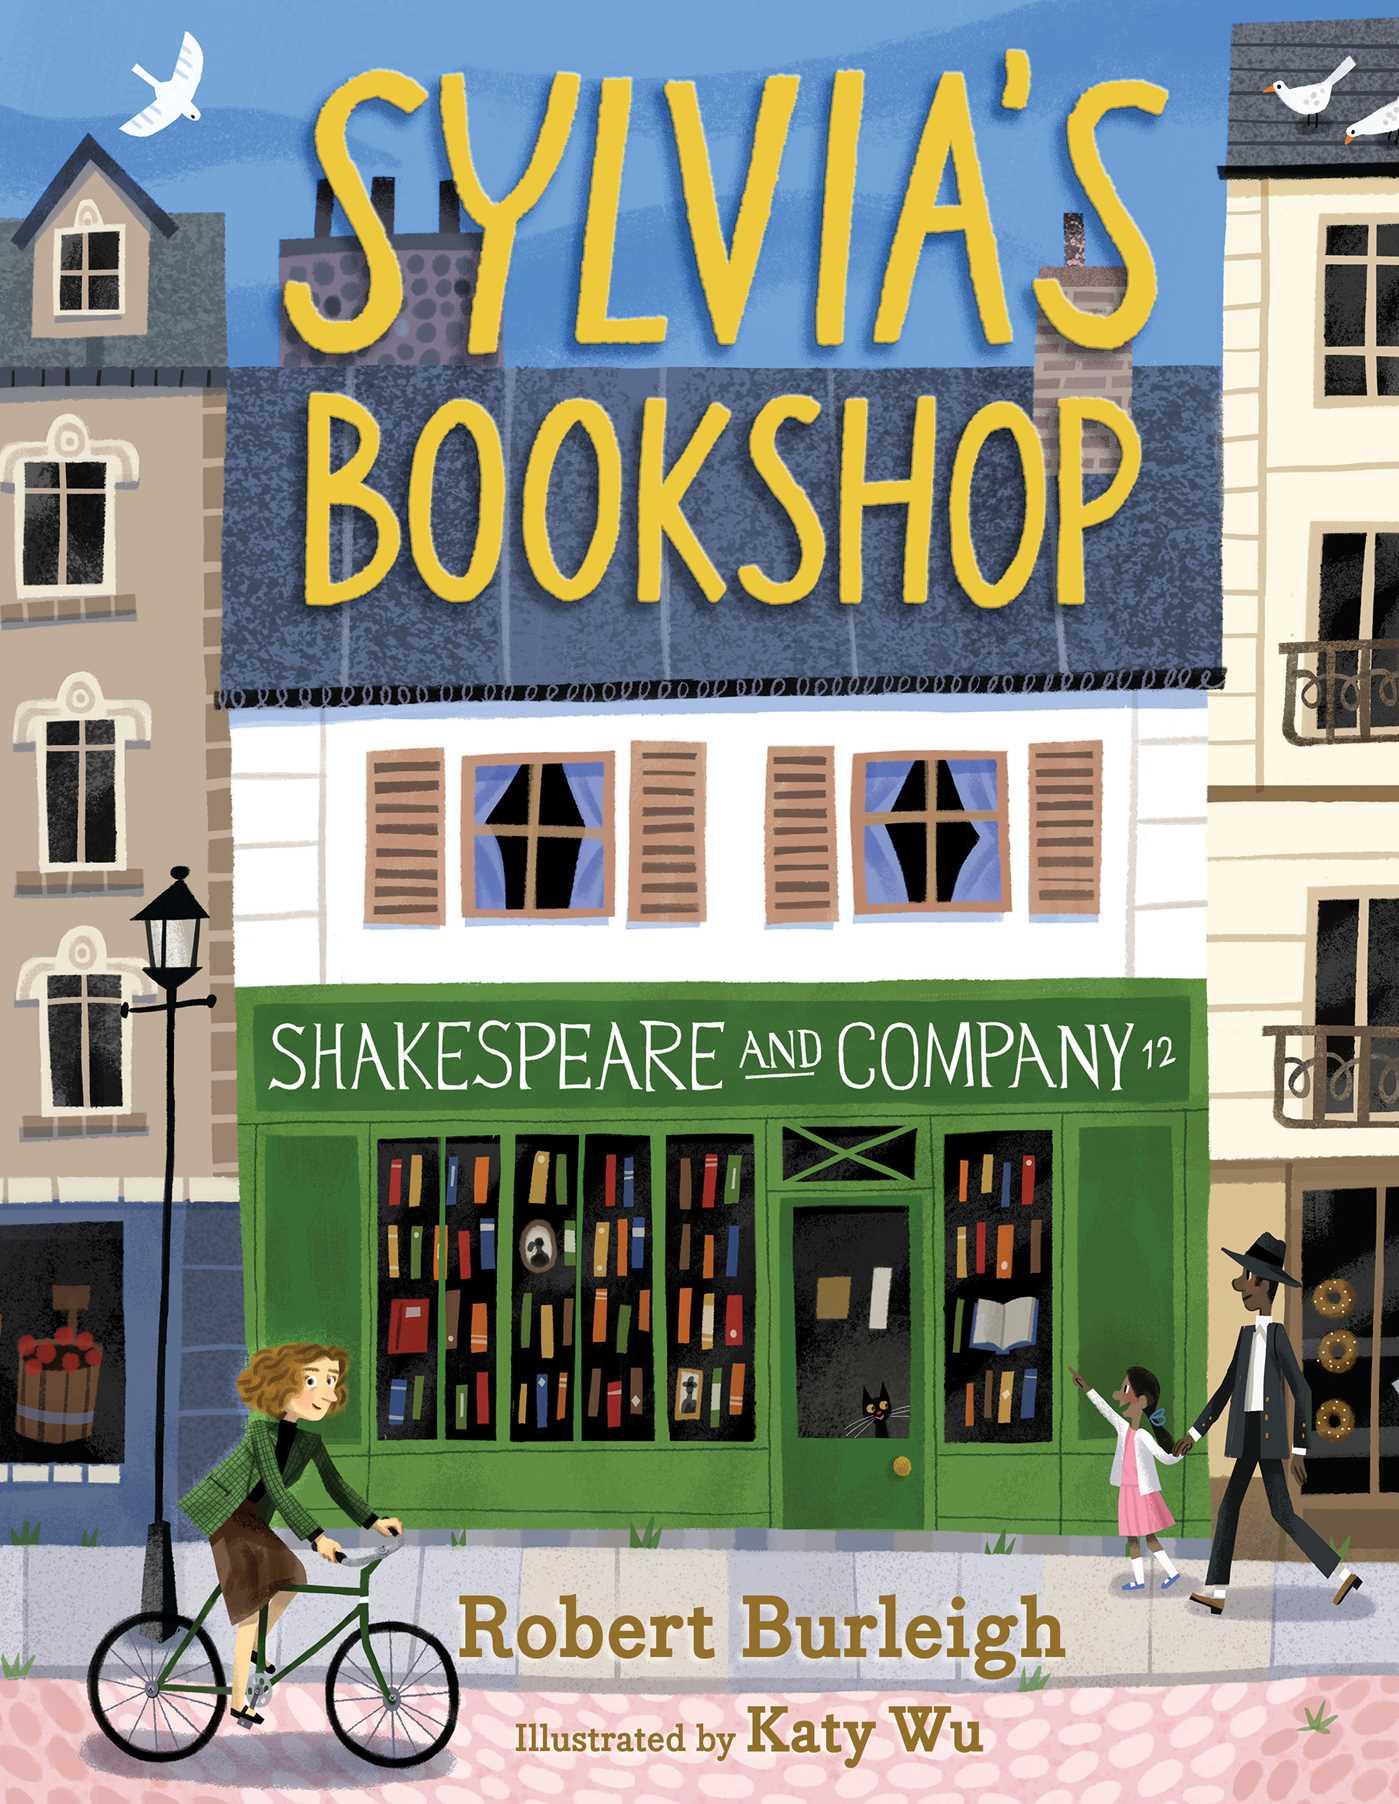 Sylvias bookshop 9781481472456 hr